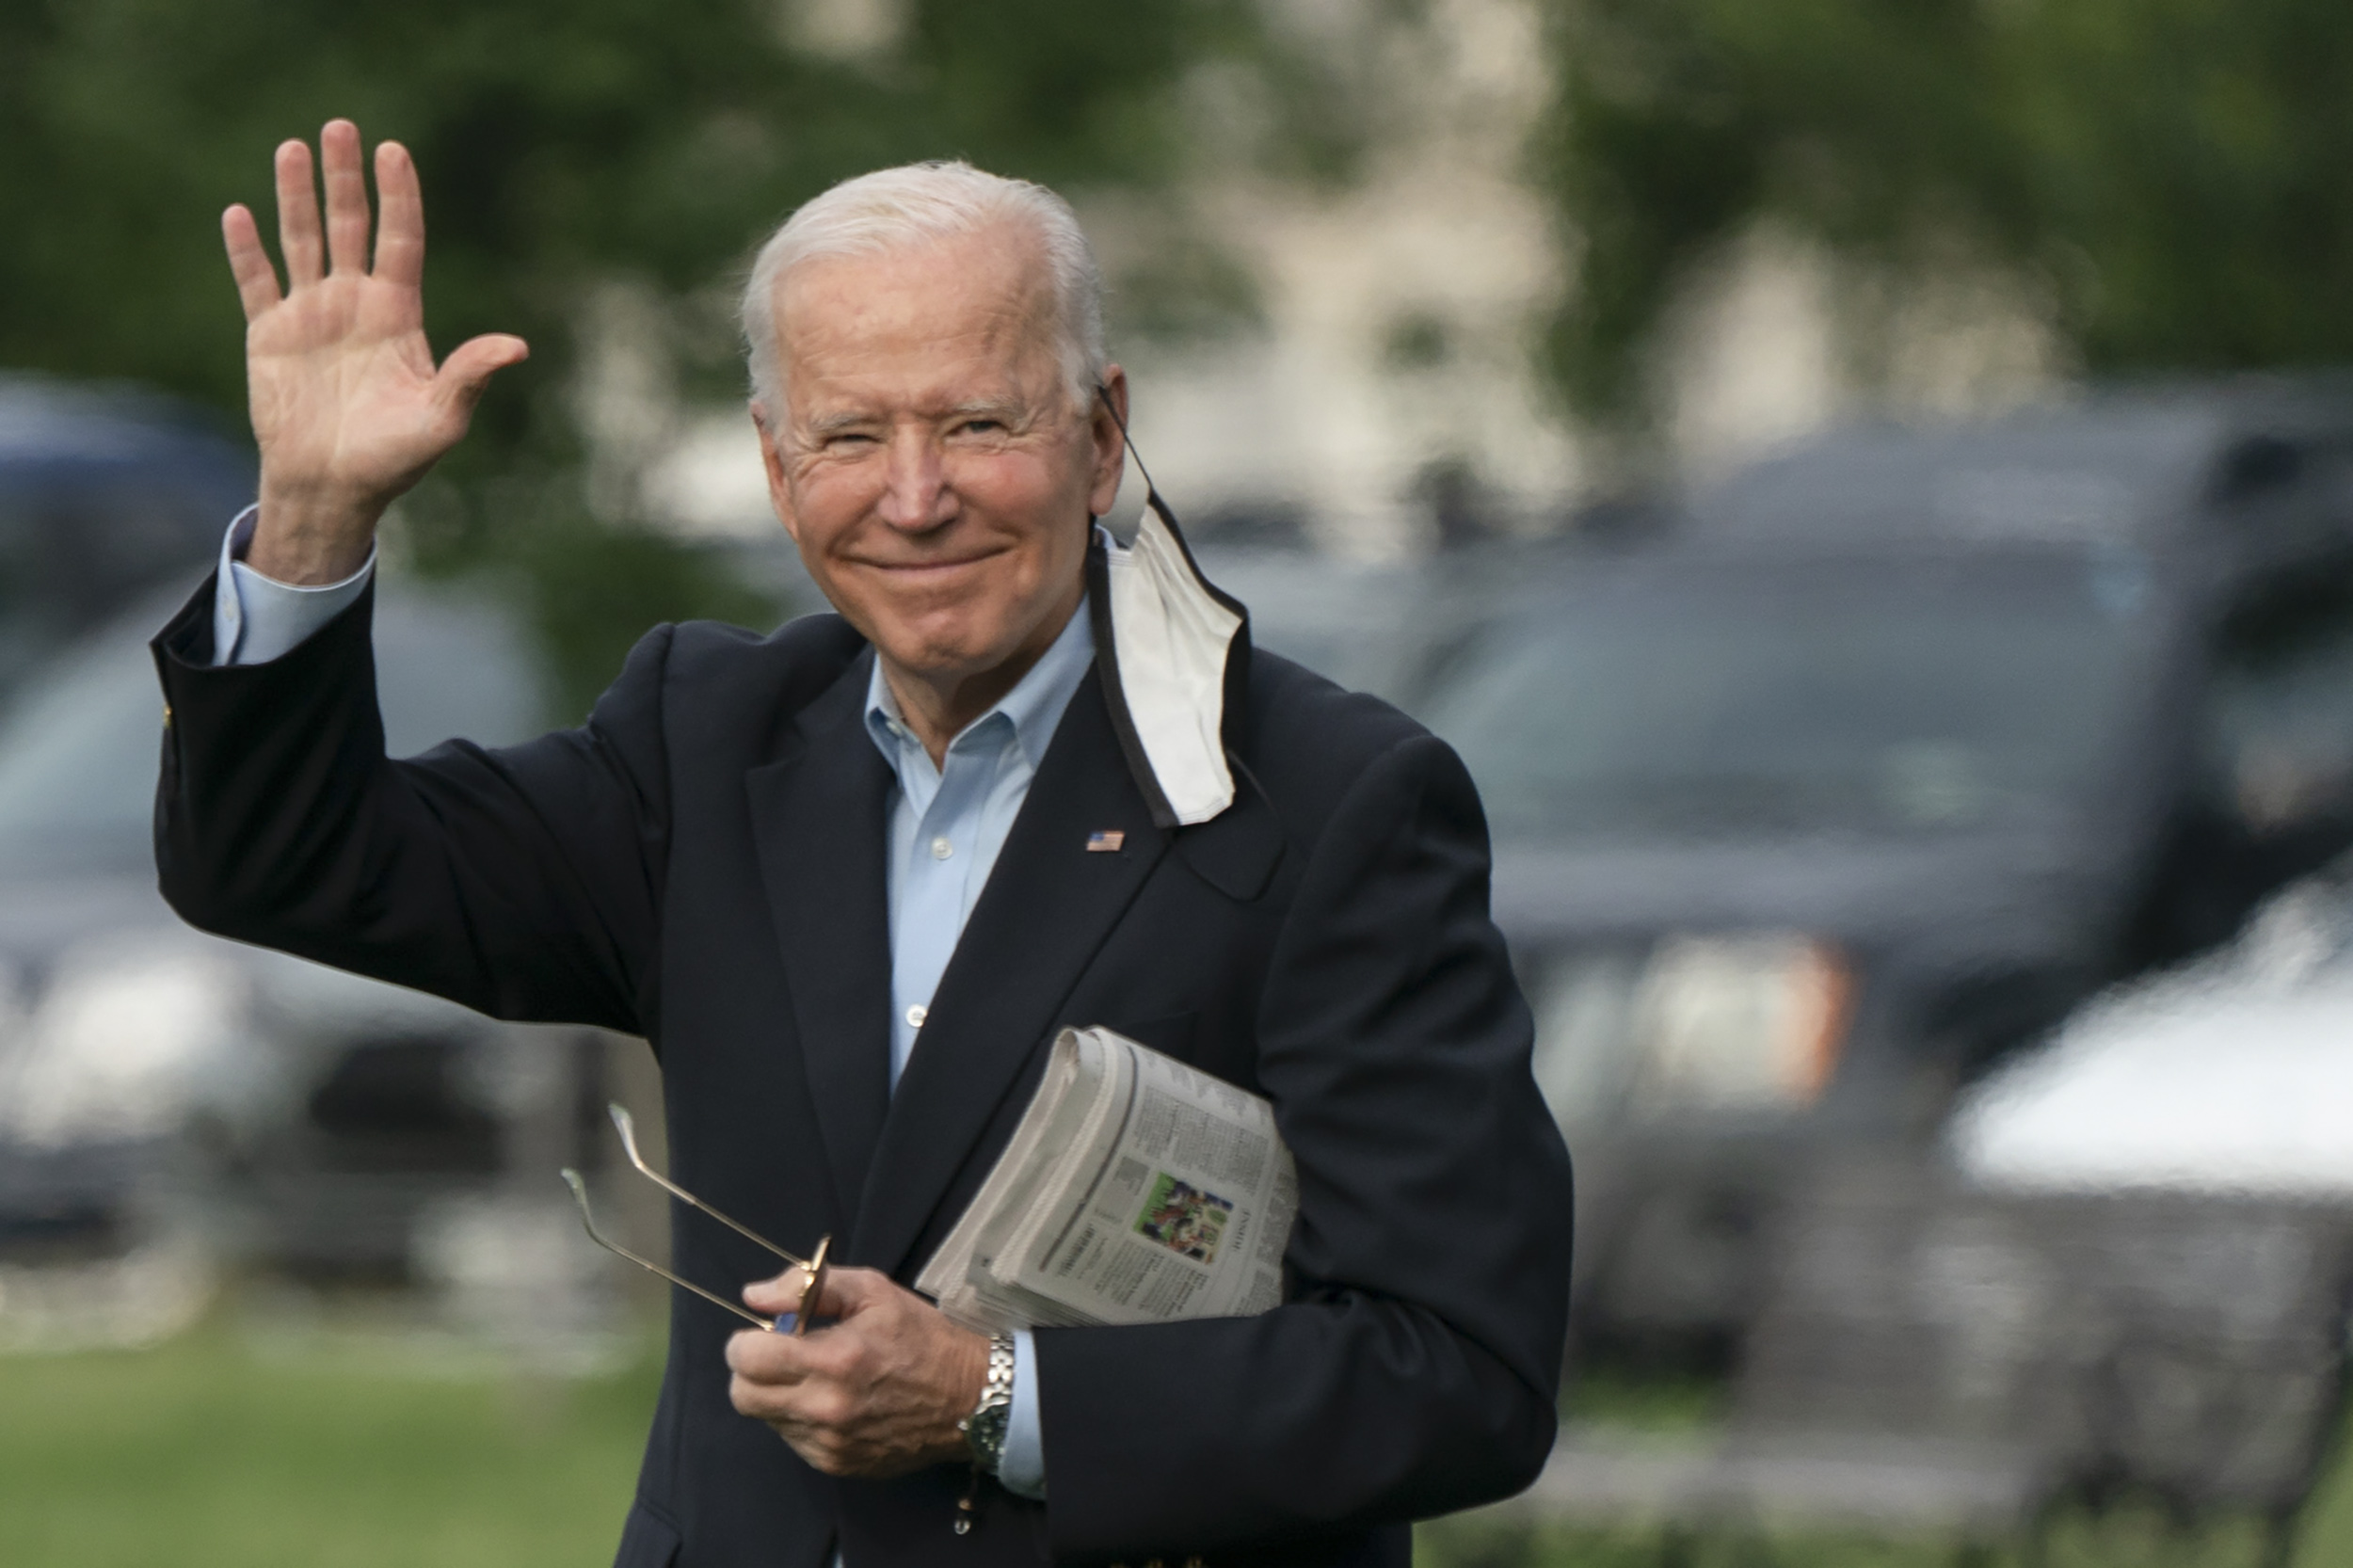 President Biden waves as he crosses the White House lawn.